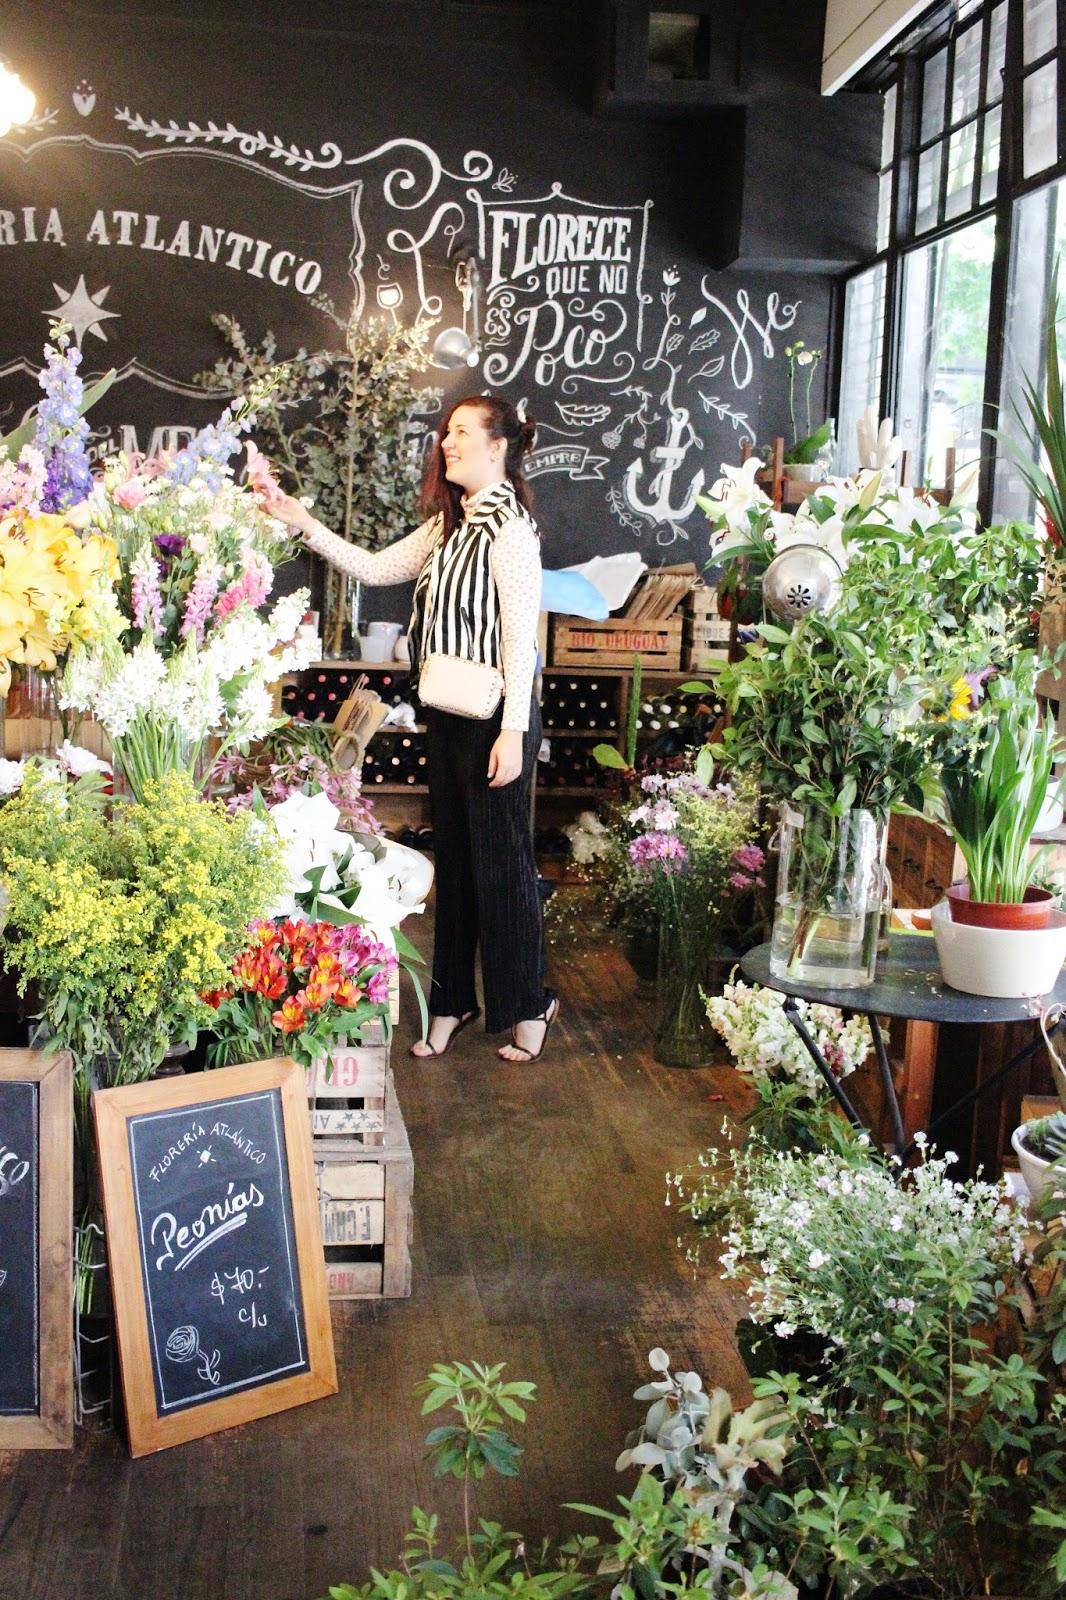 bar florería atlantico